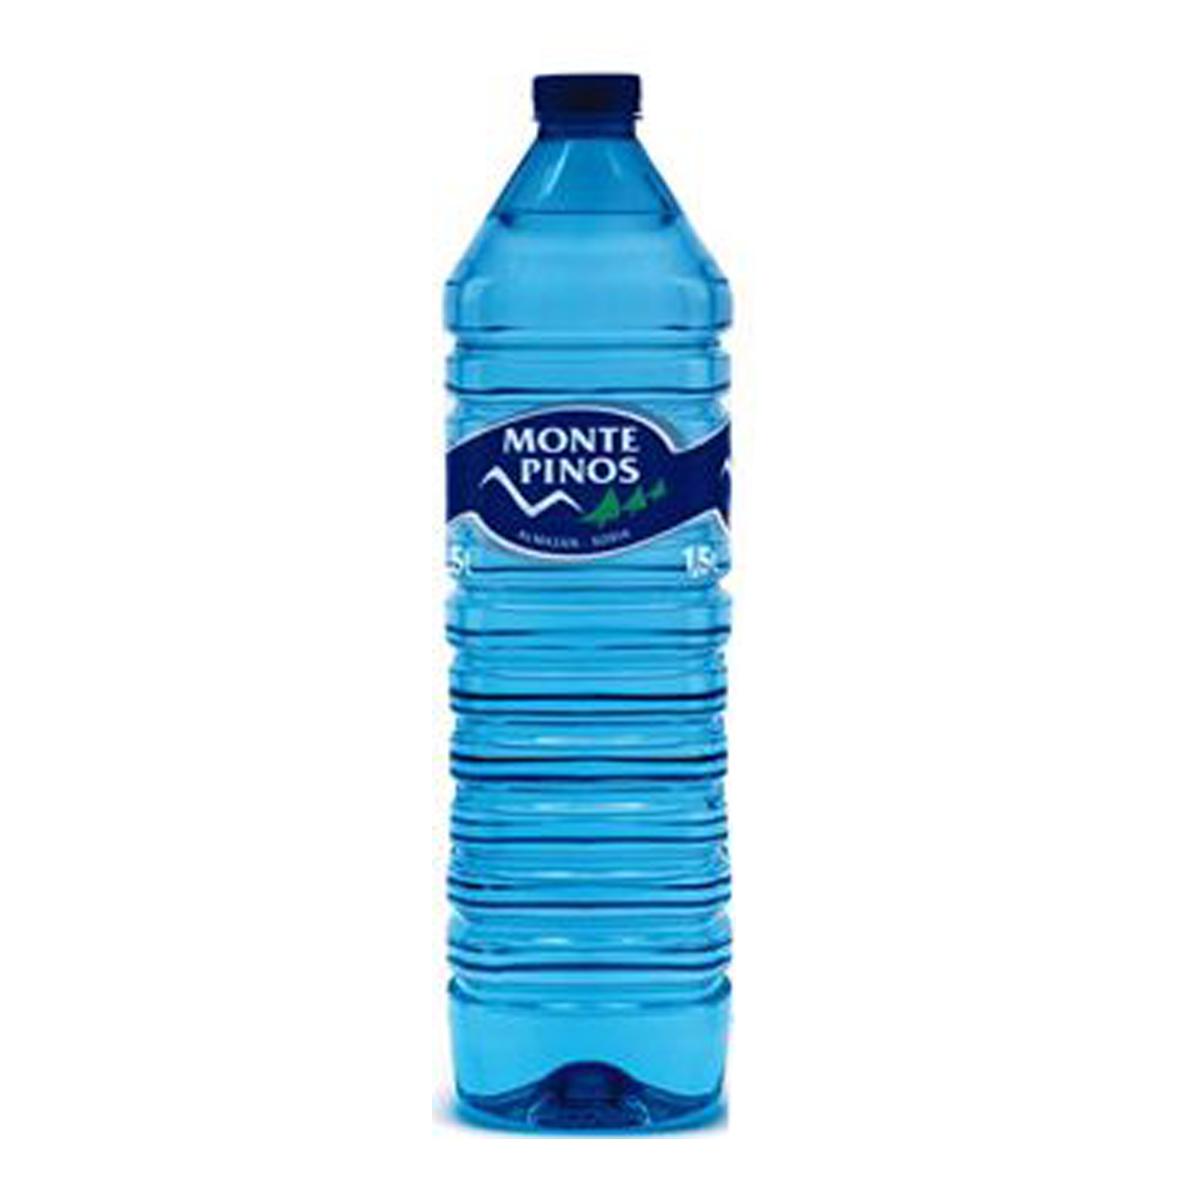 Monte pinos: bergwater 1,5L